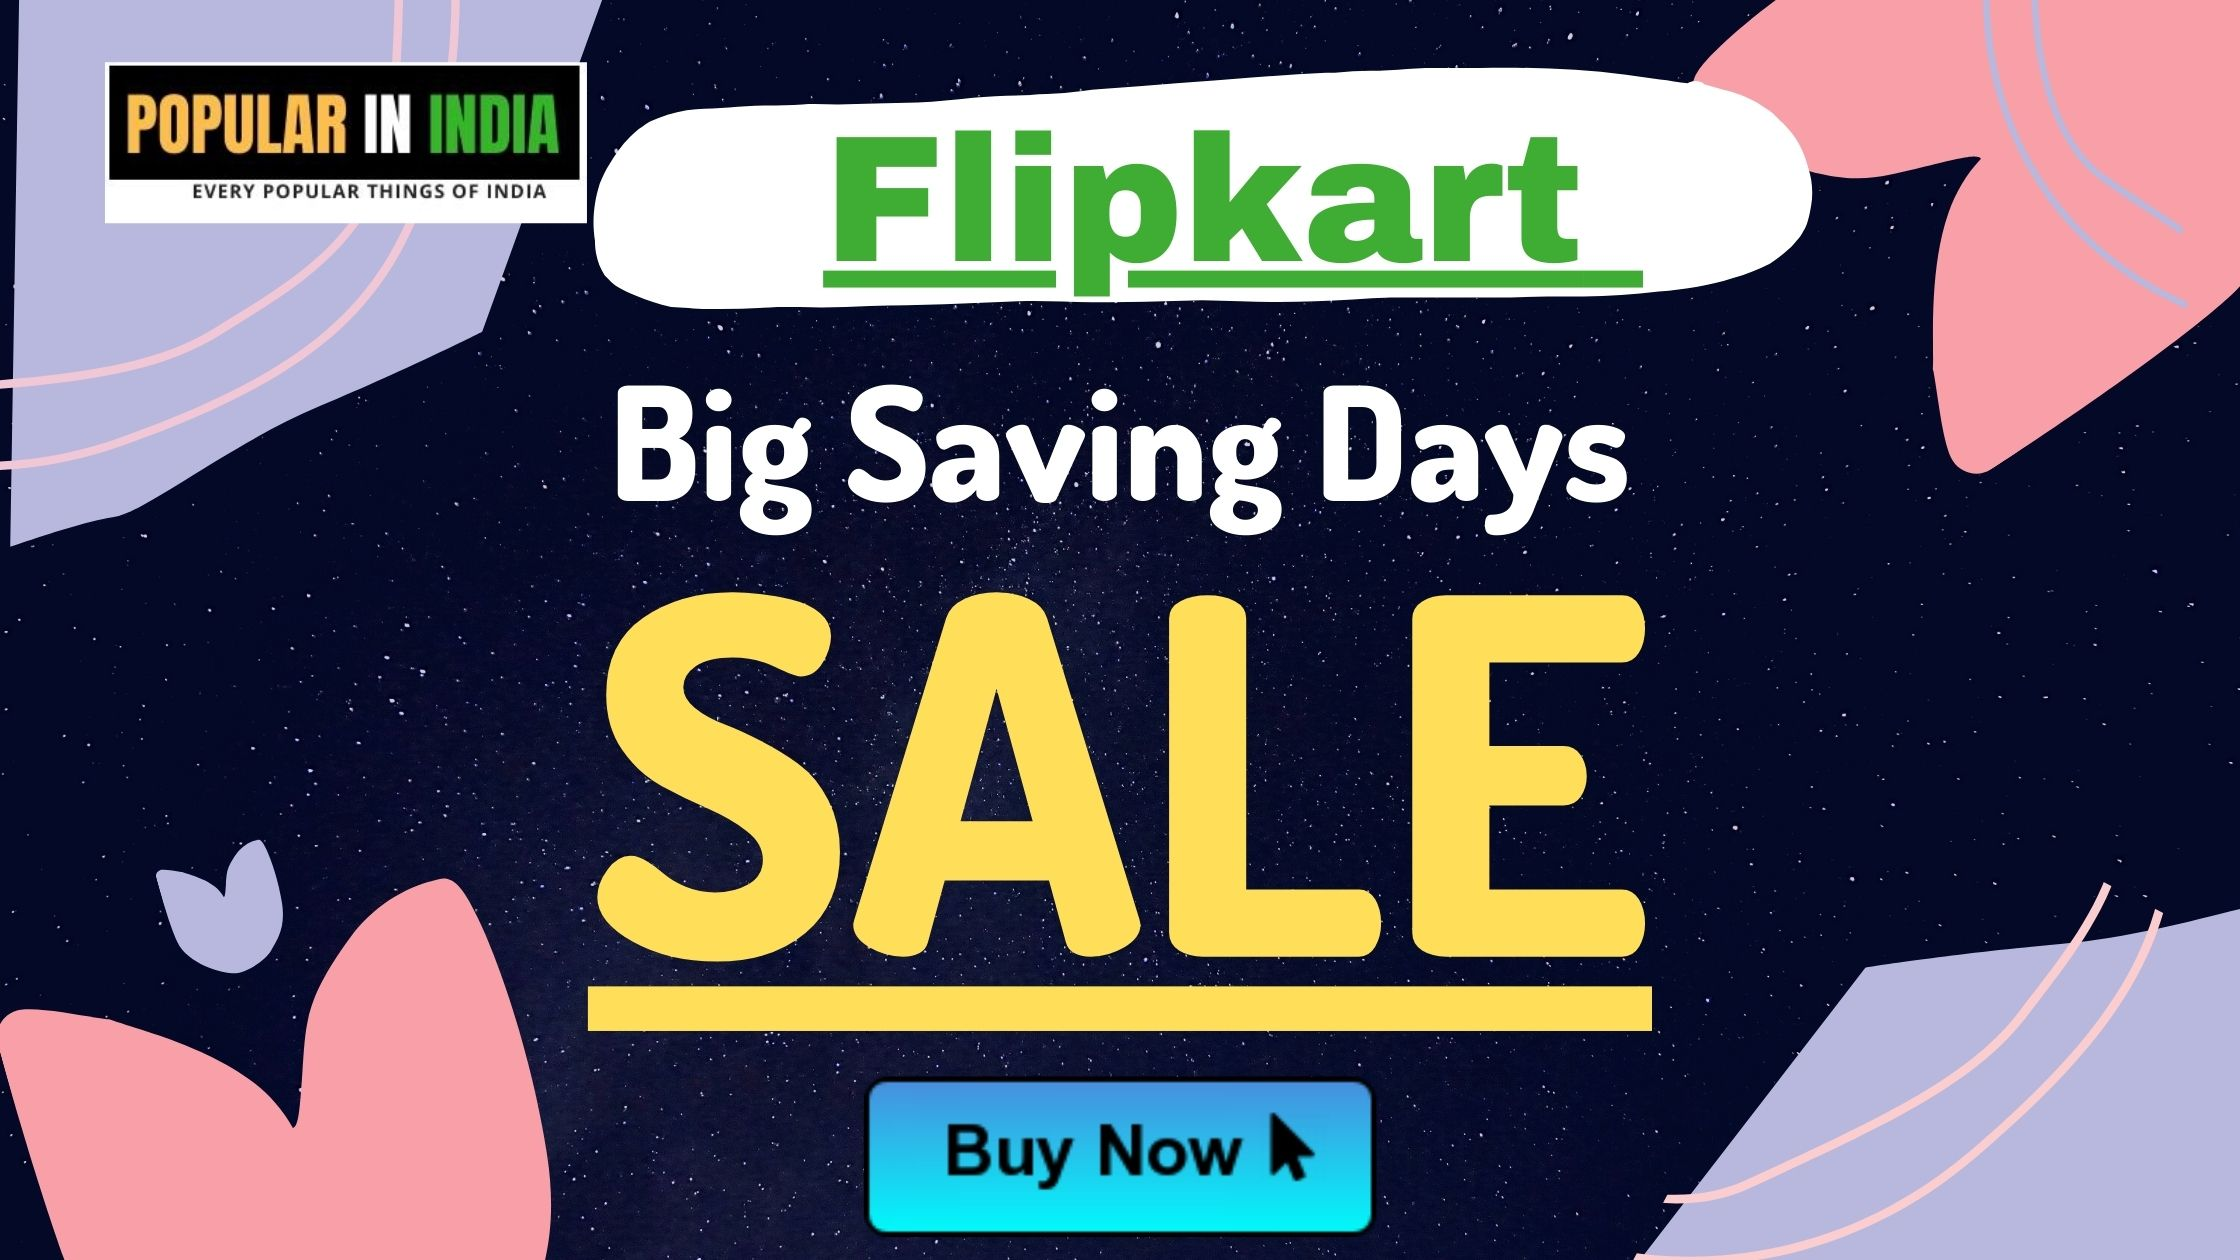 Flipkart big saving day sale offer